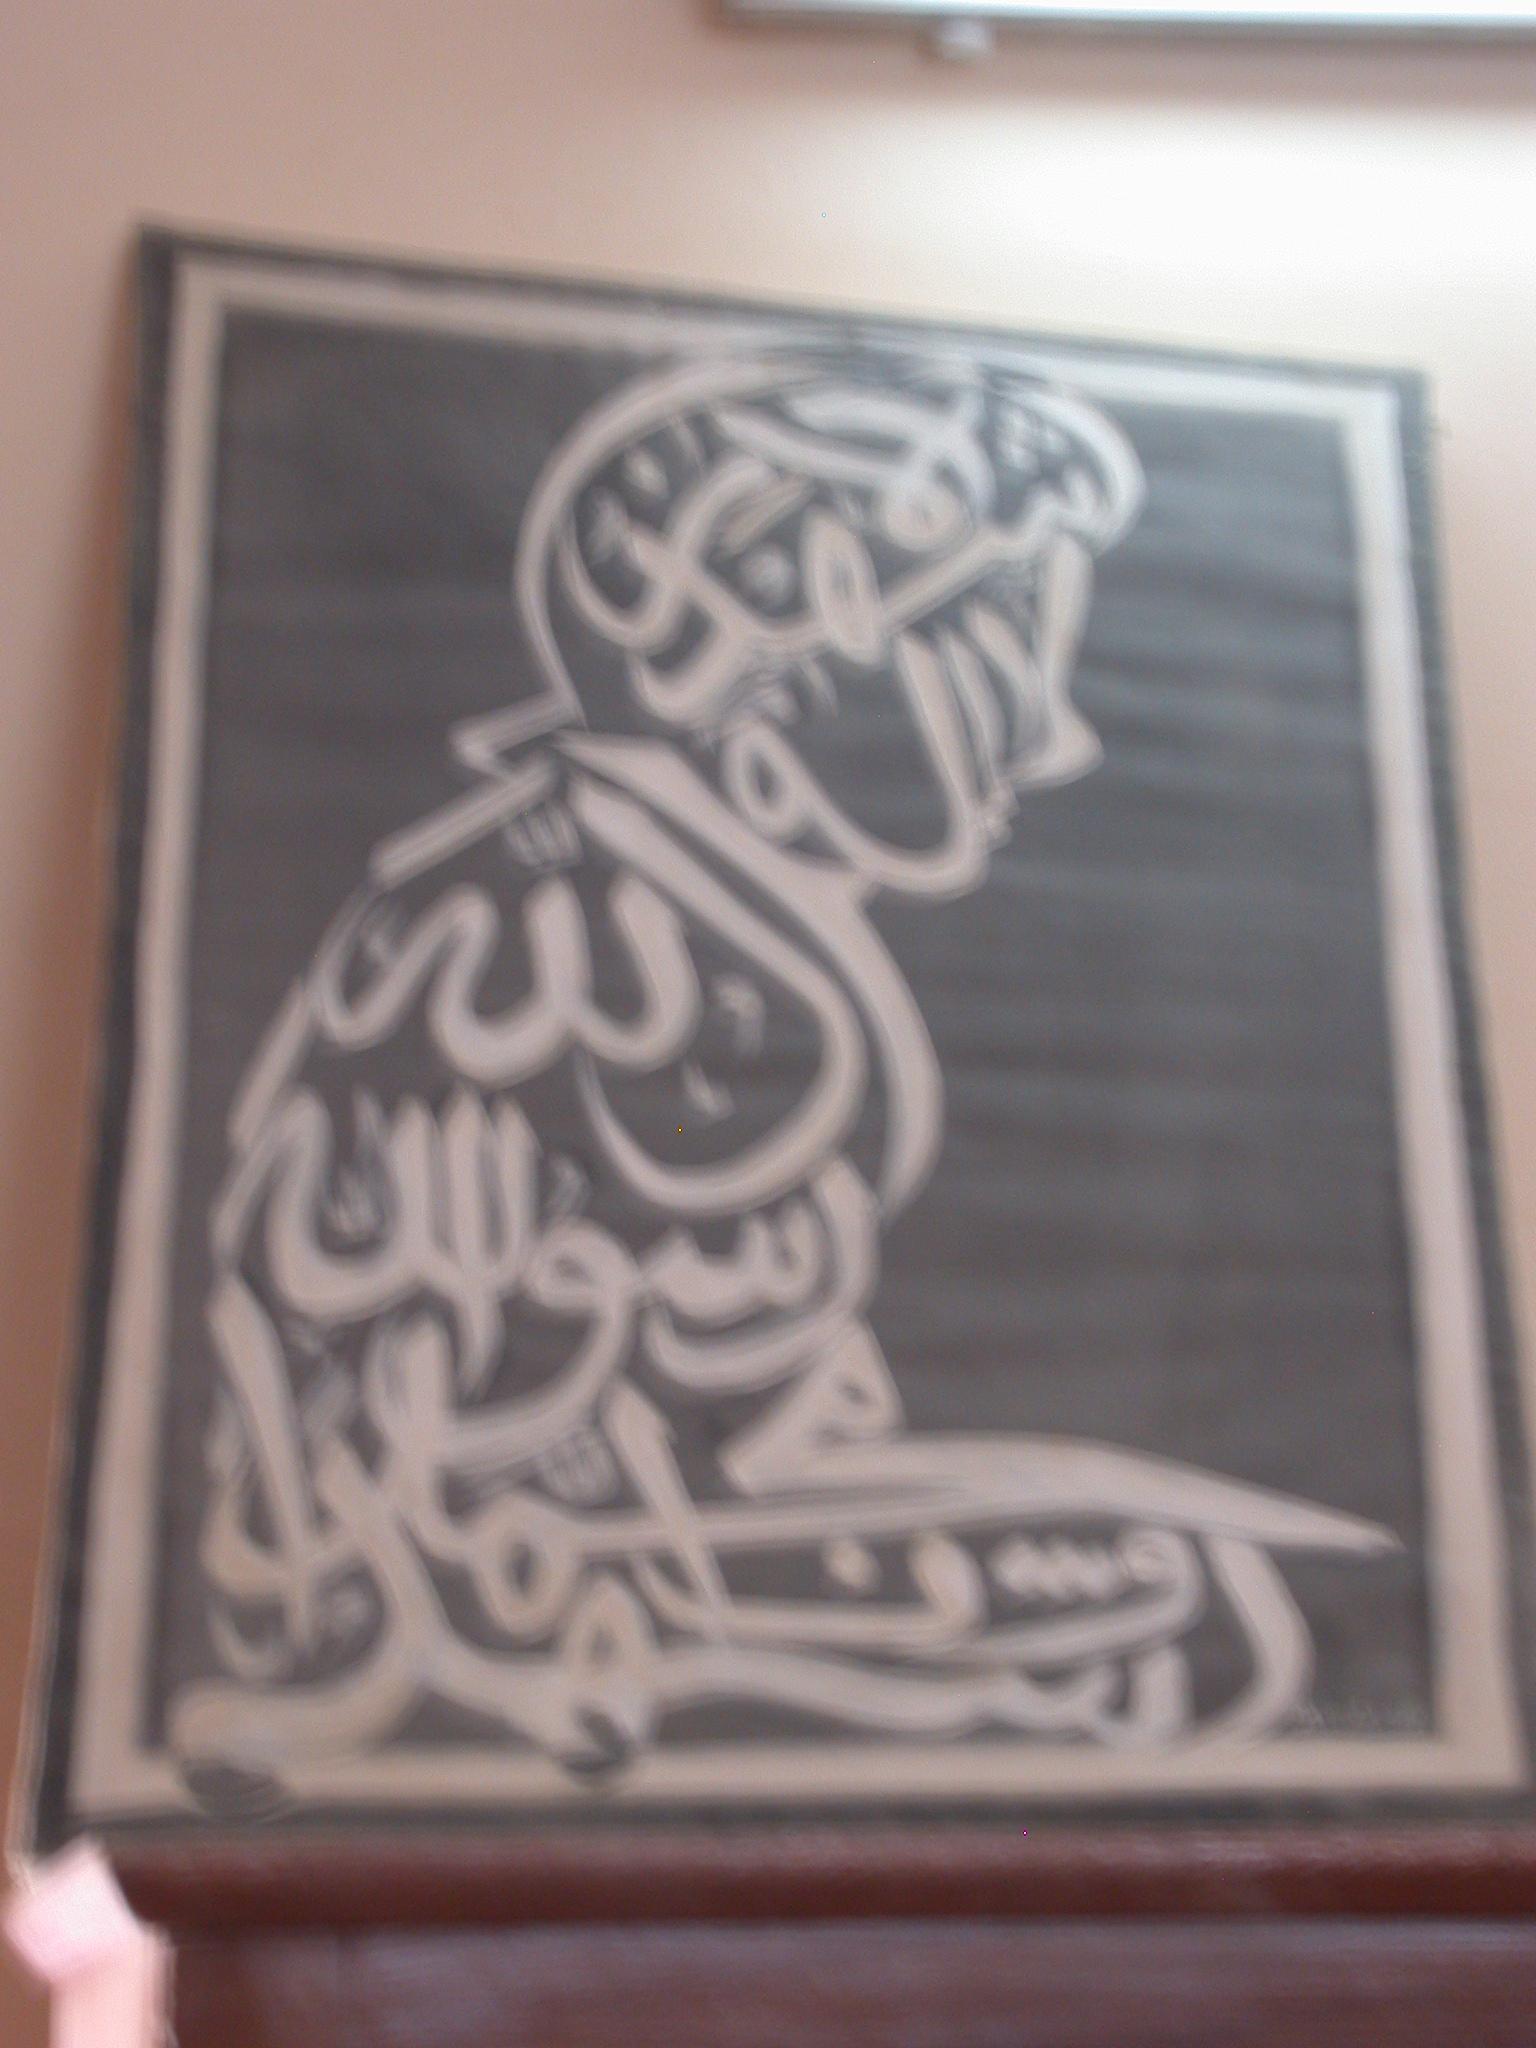 Koranic Prayer Art, Ahmed Baba Institute, Institut des Hautes Etudes et de Recherches Islamiques, Timbuktu, Mali